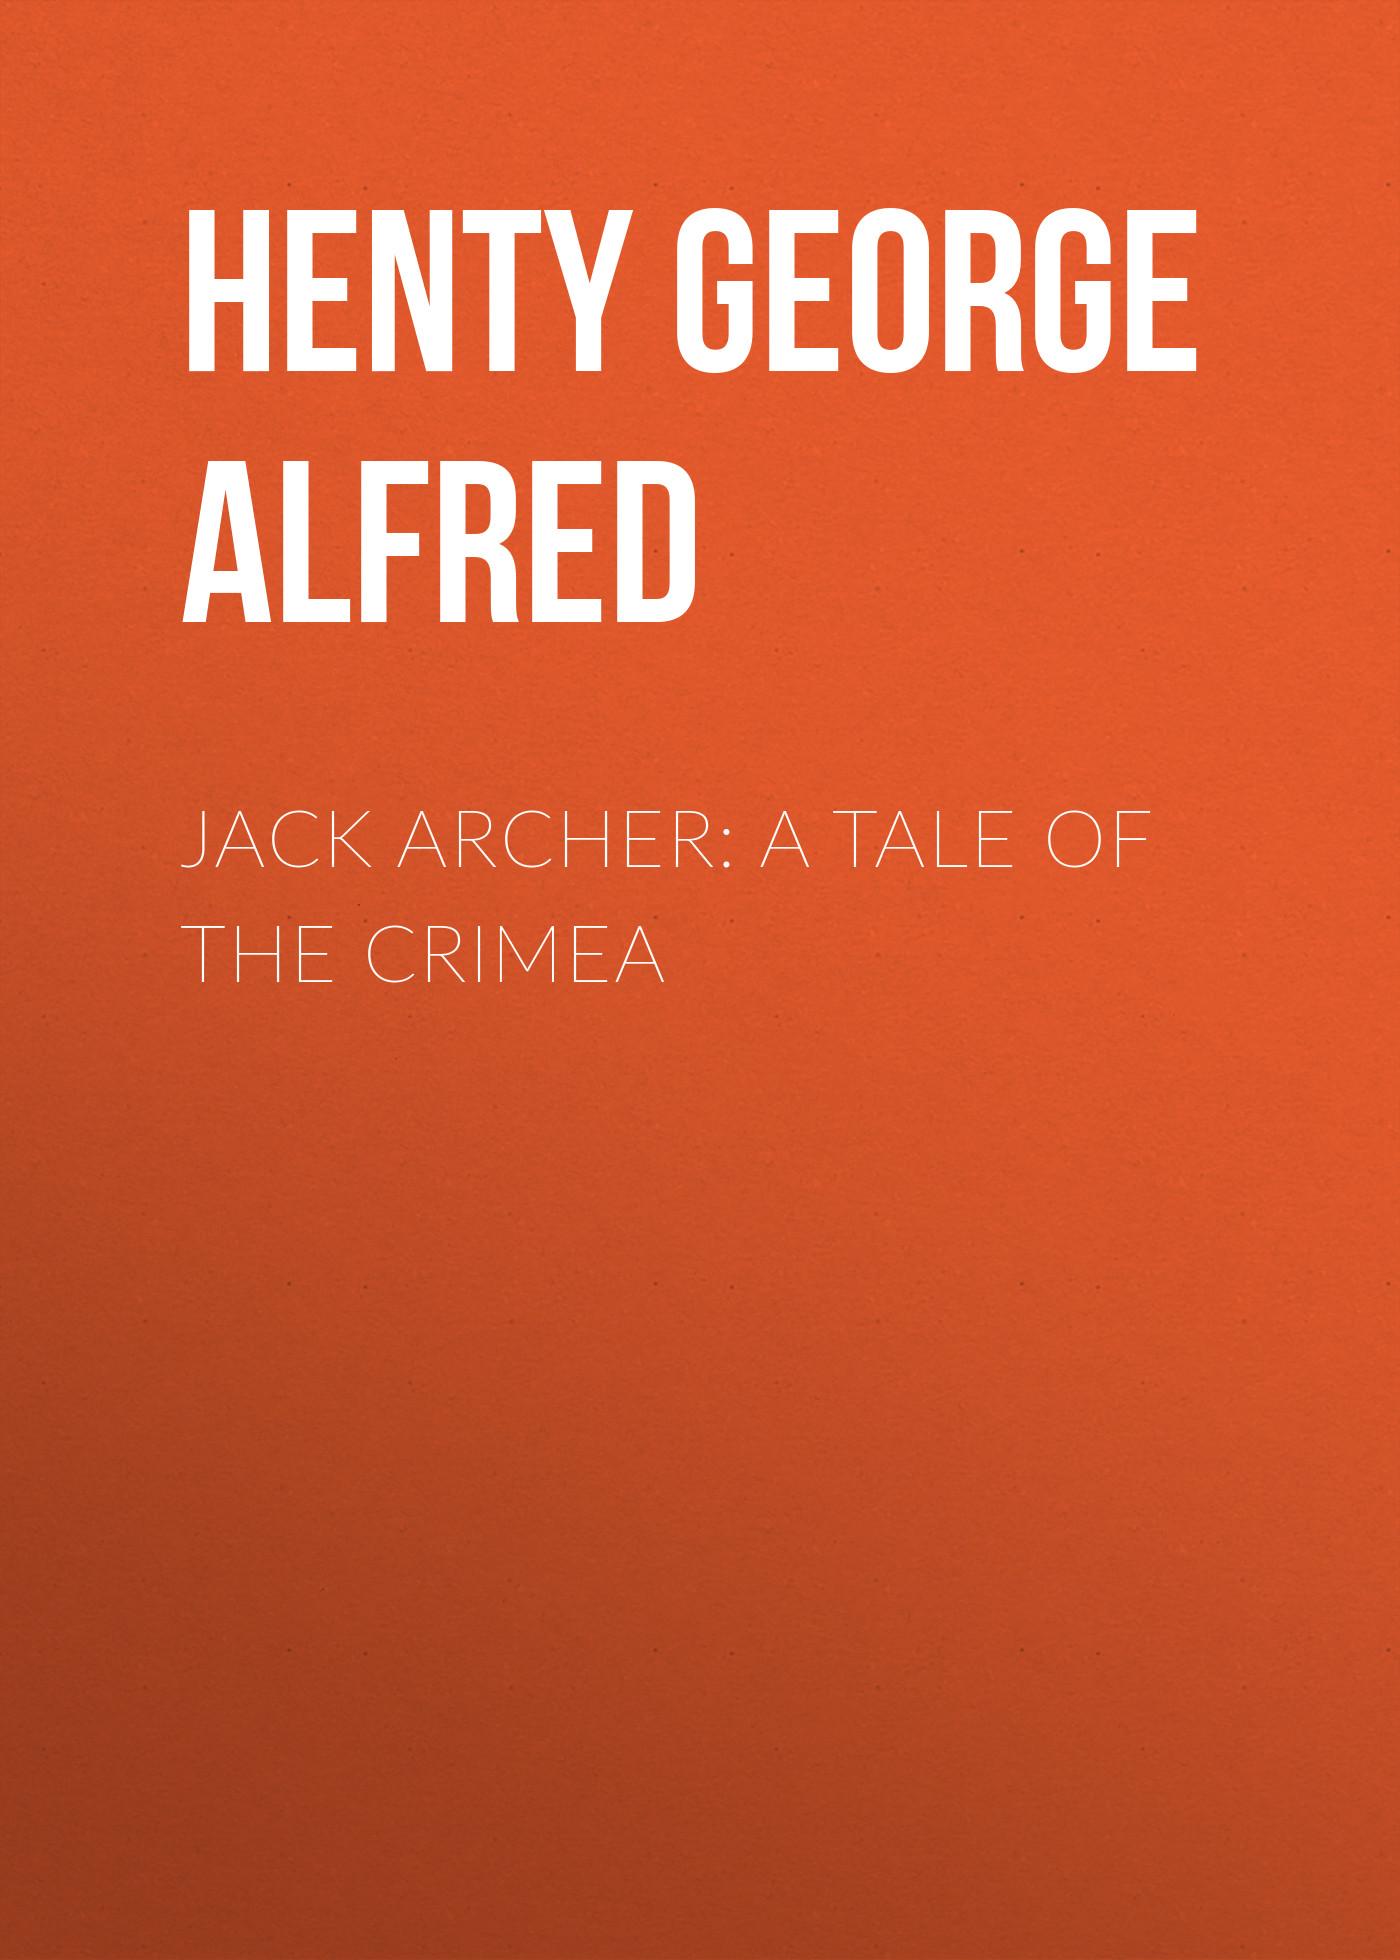 Henty George Alfred Jack Archer: A Tale of the Crimea henty george alfred saint bartholomew s eve a tale of the huguenot wars